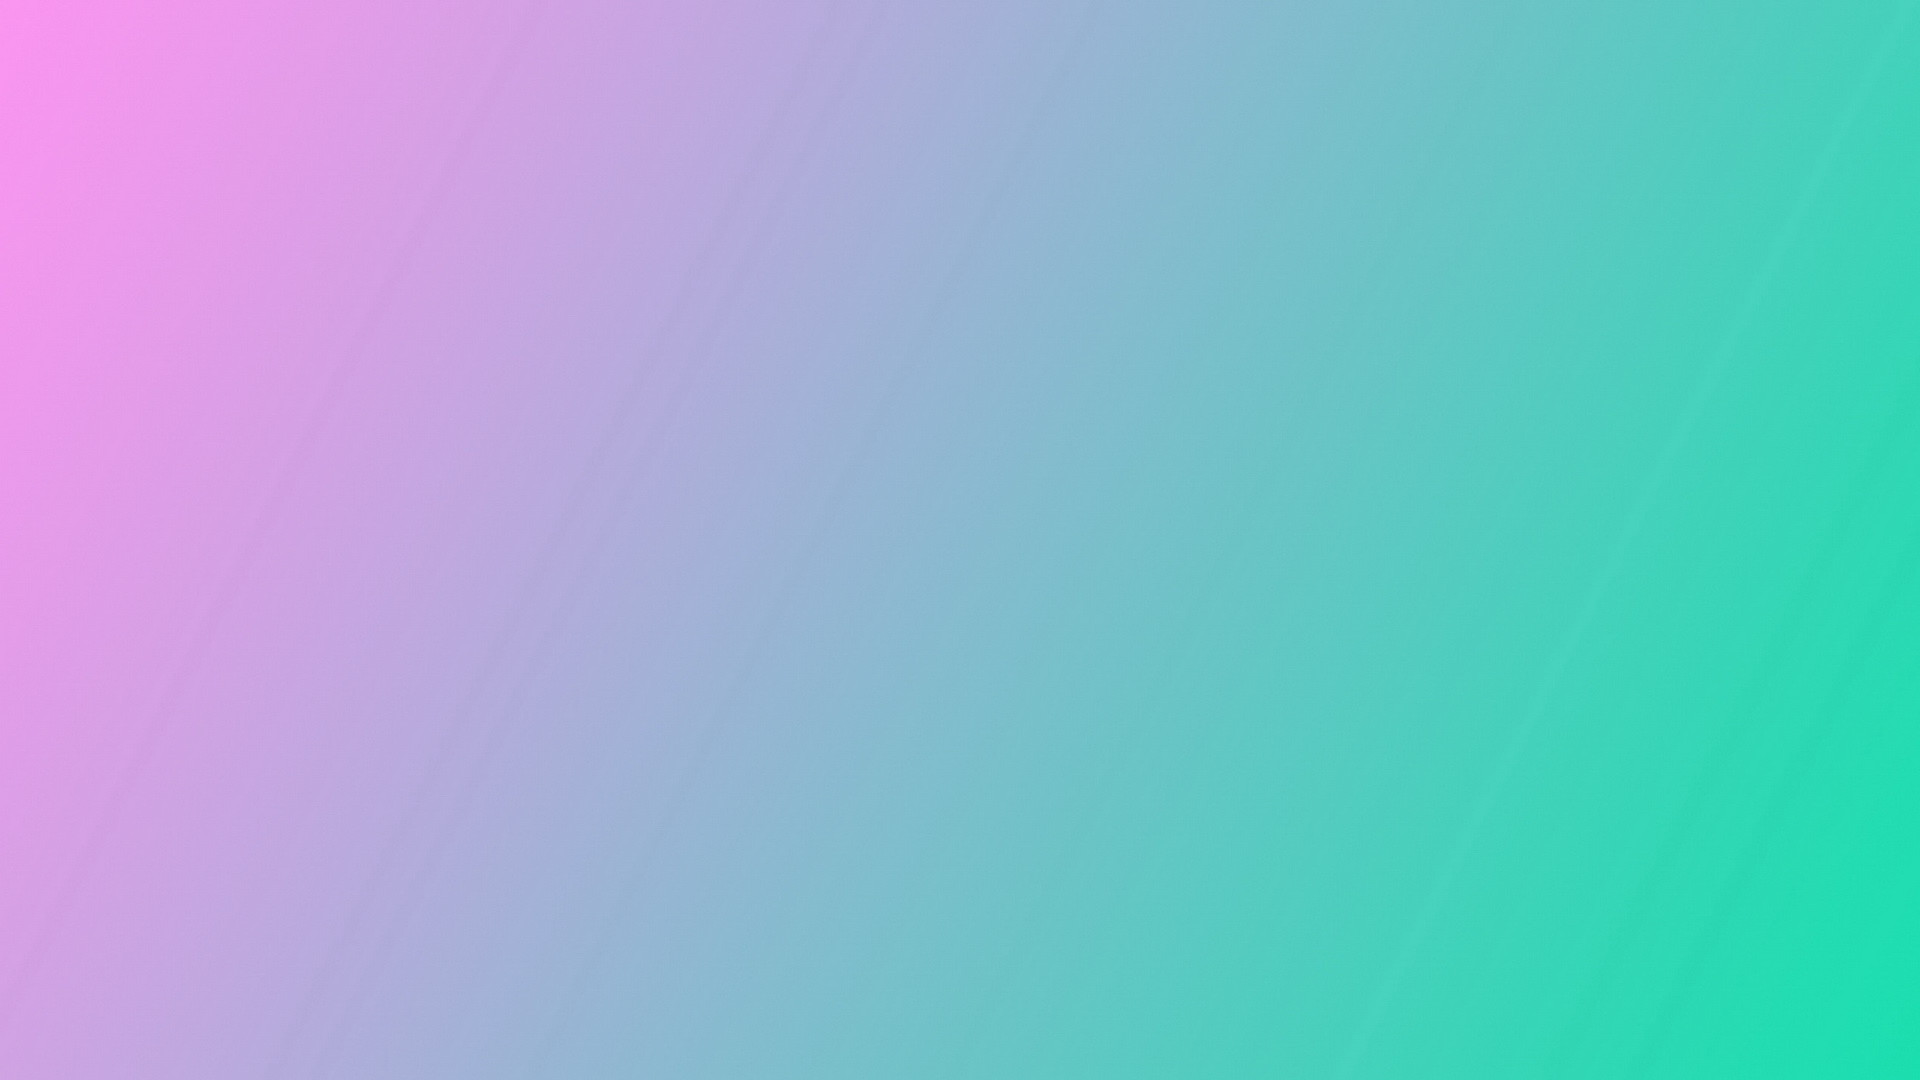 Cute Teal Wallpapers Pastel Colors Wallpaper 183 ①